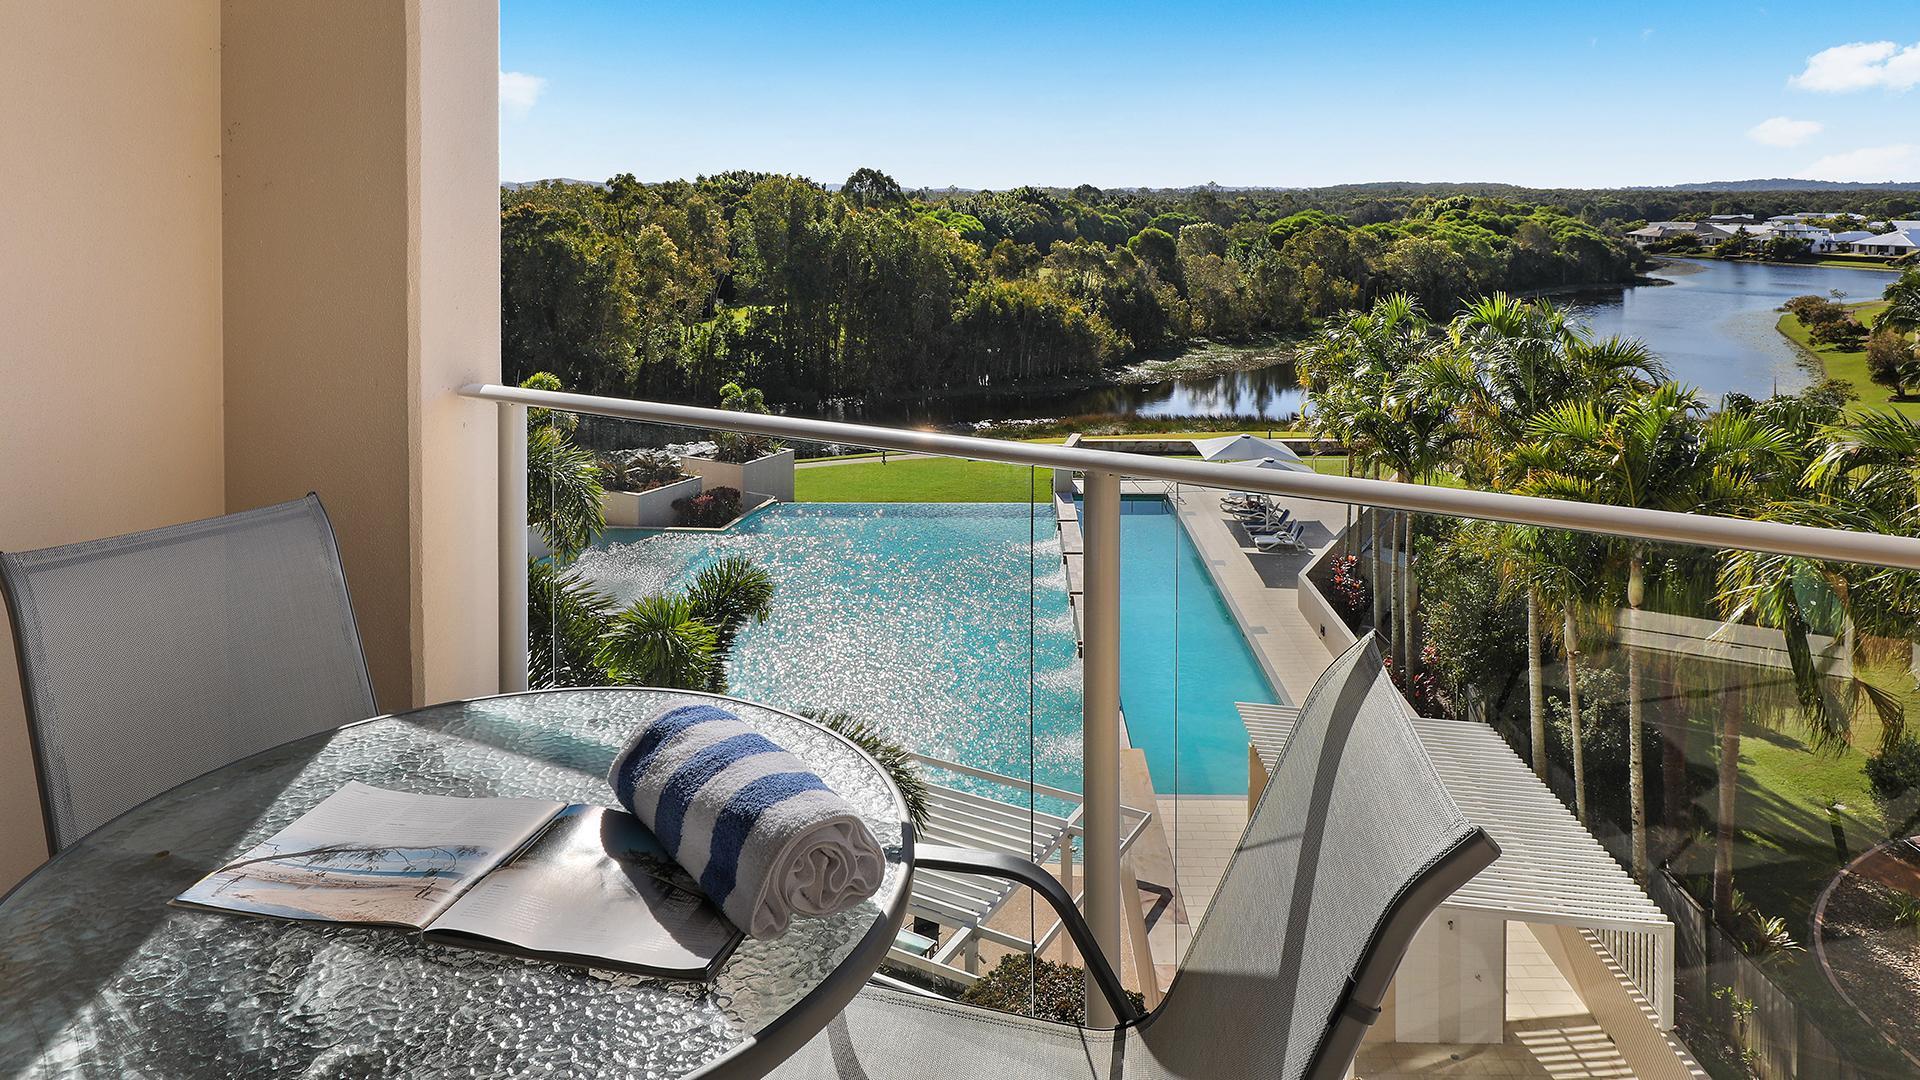 Studio image 1 at Pelican Waters Resort by Sunshine Coast Regional, Queensland, Australia